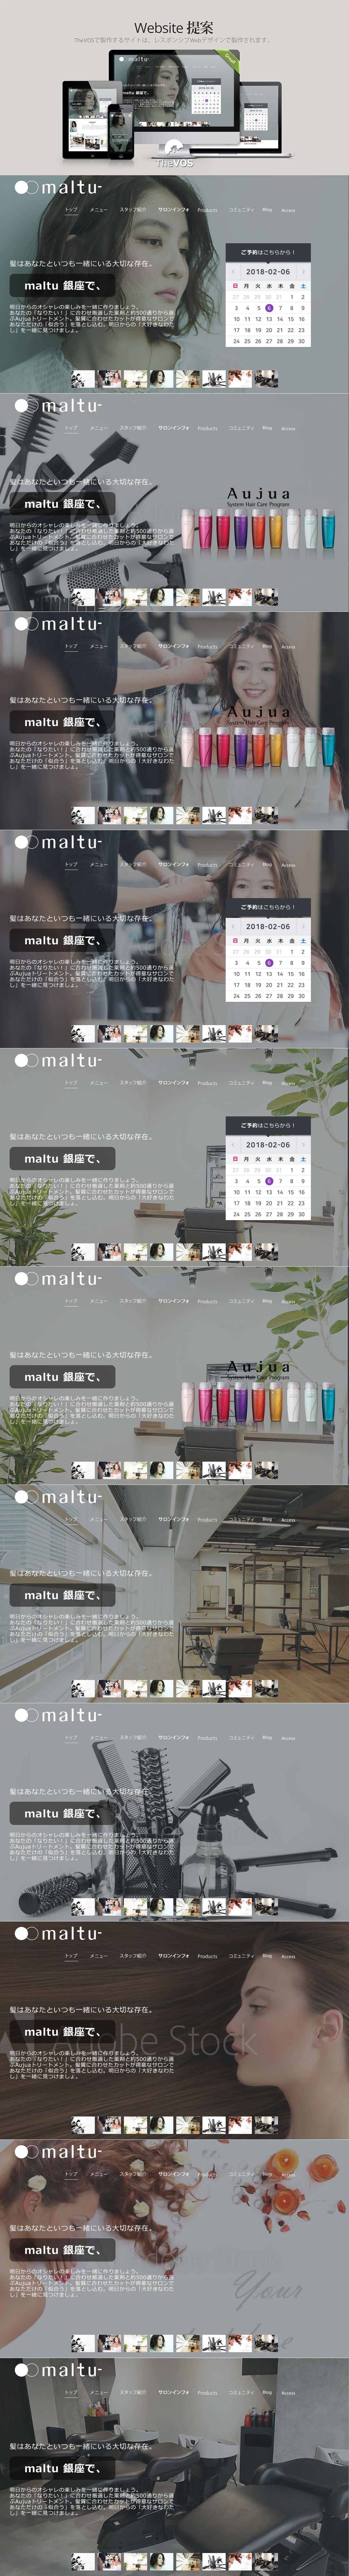 maltu_slide.jpg